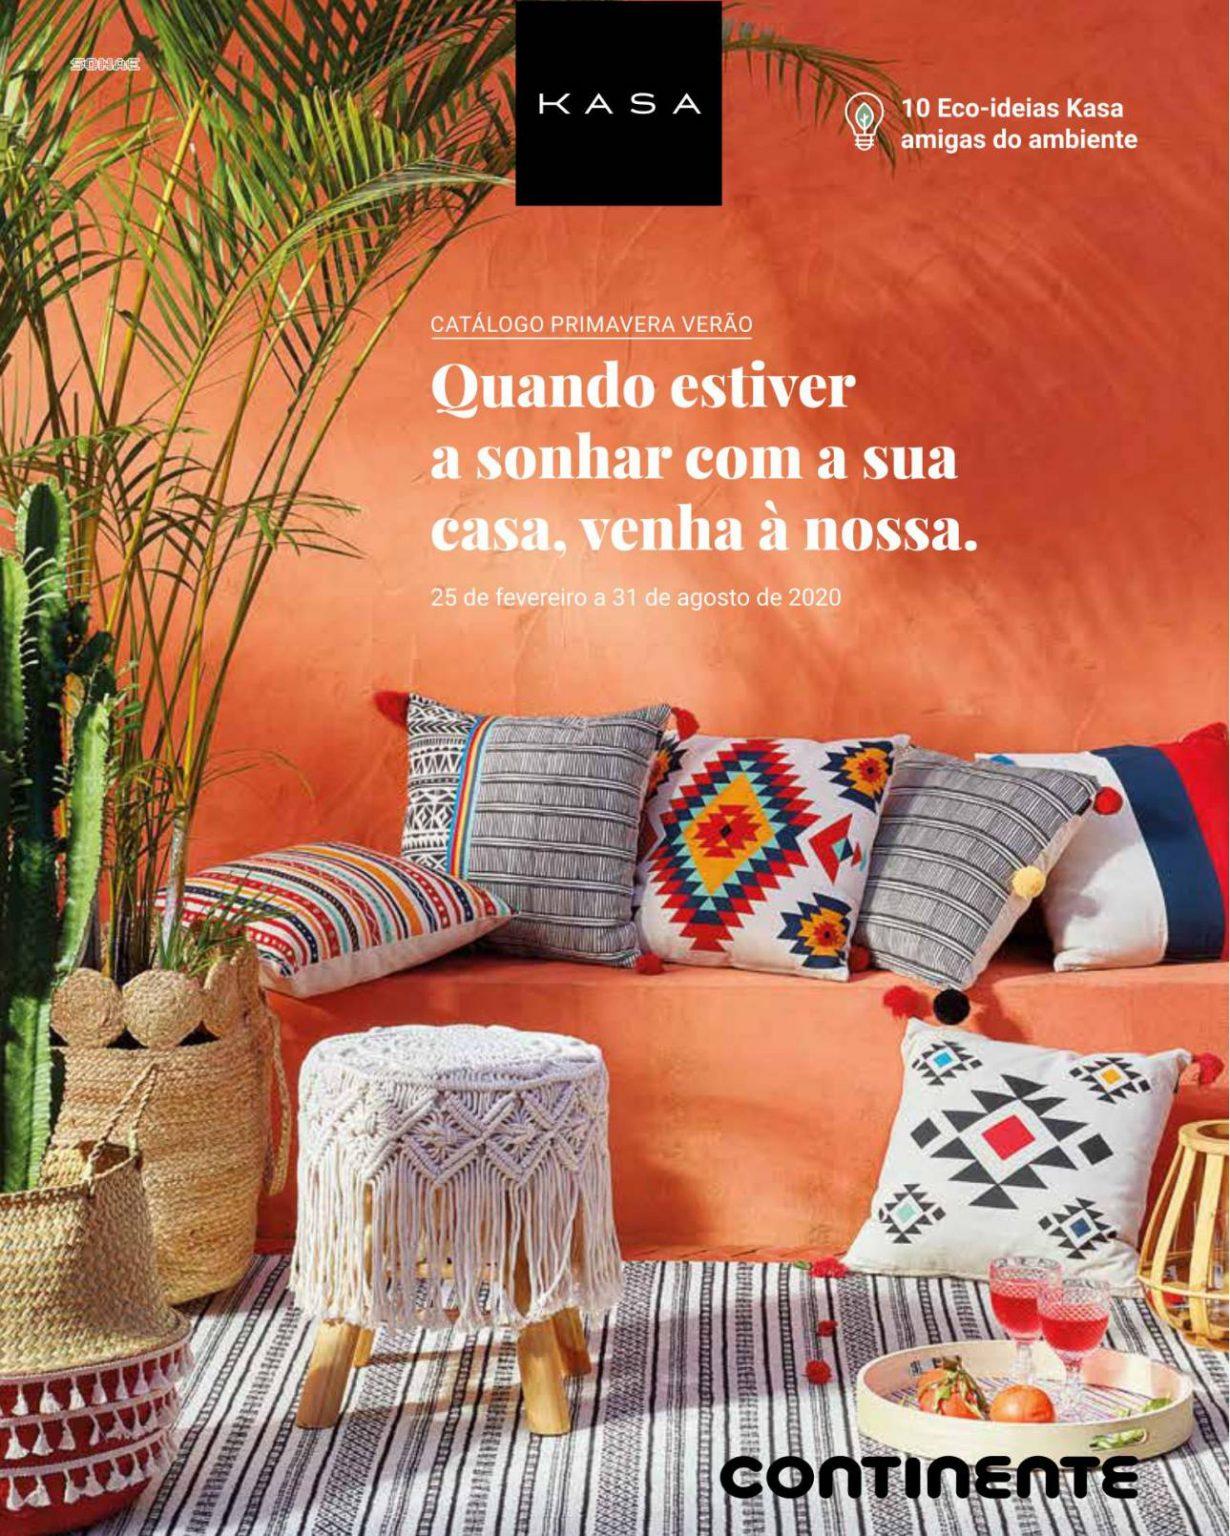 kasa folheto continente 1 1230x1536 1